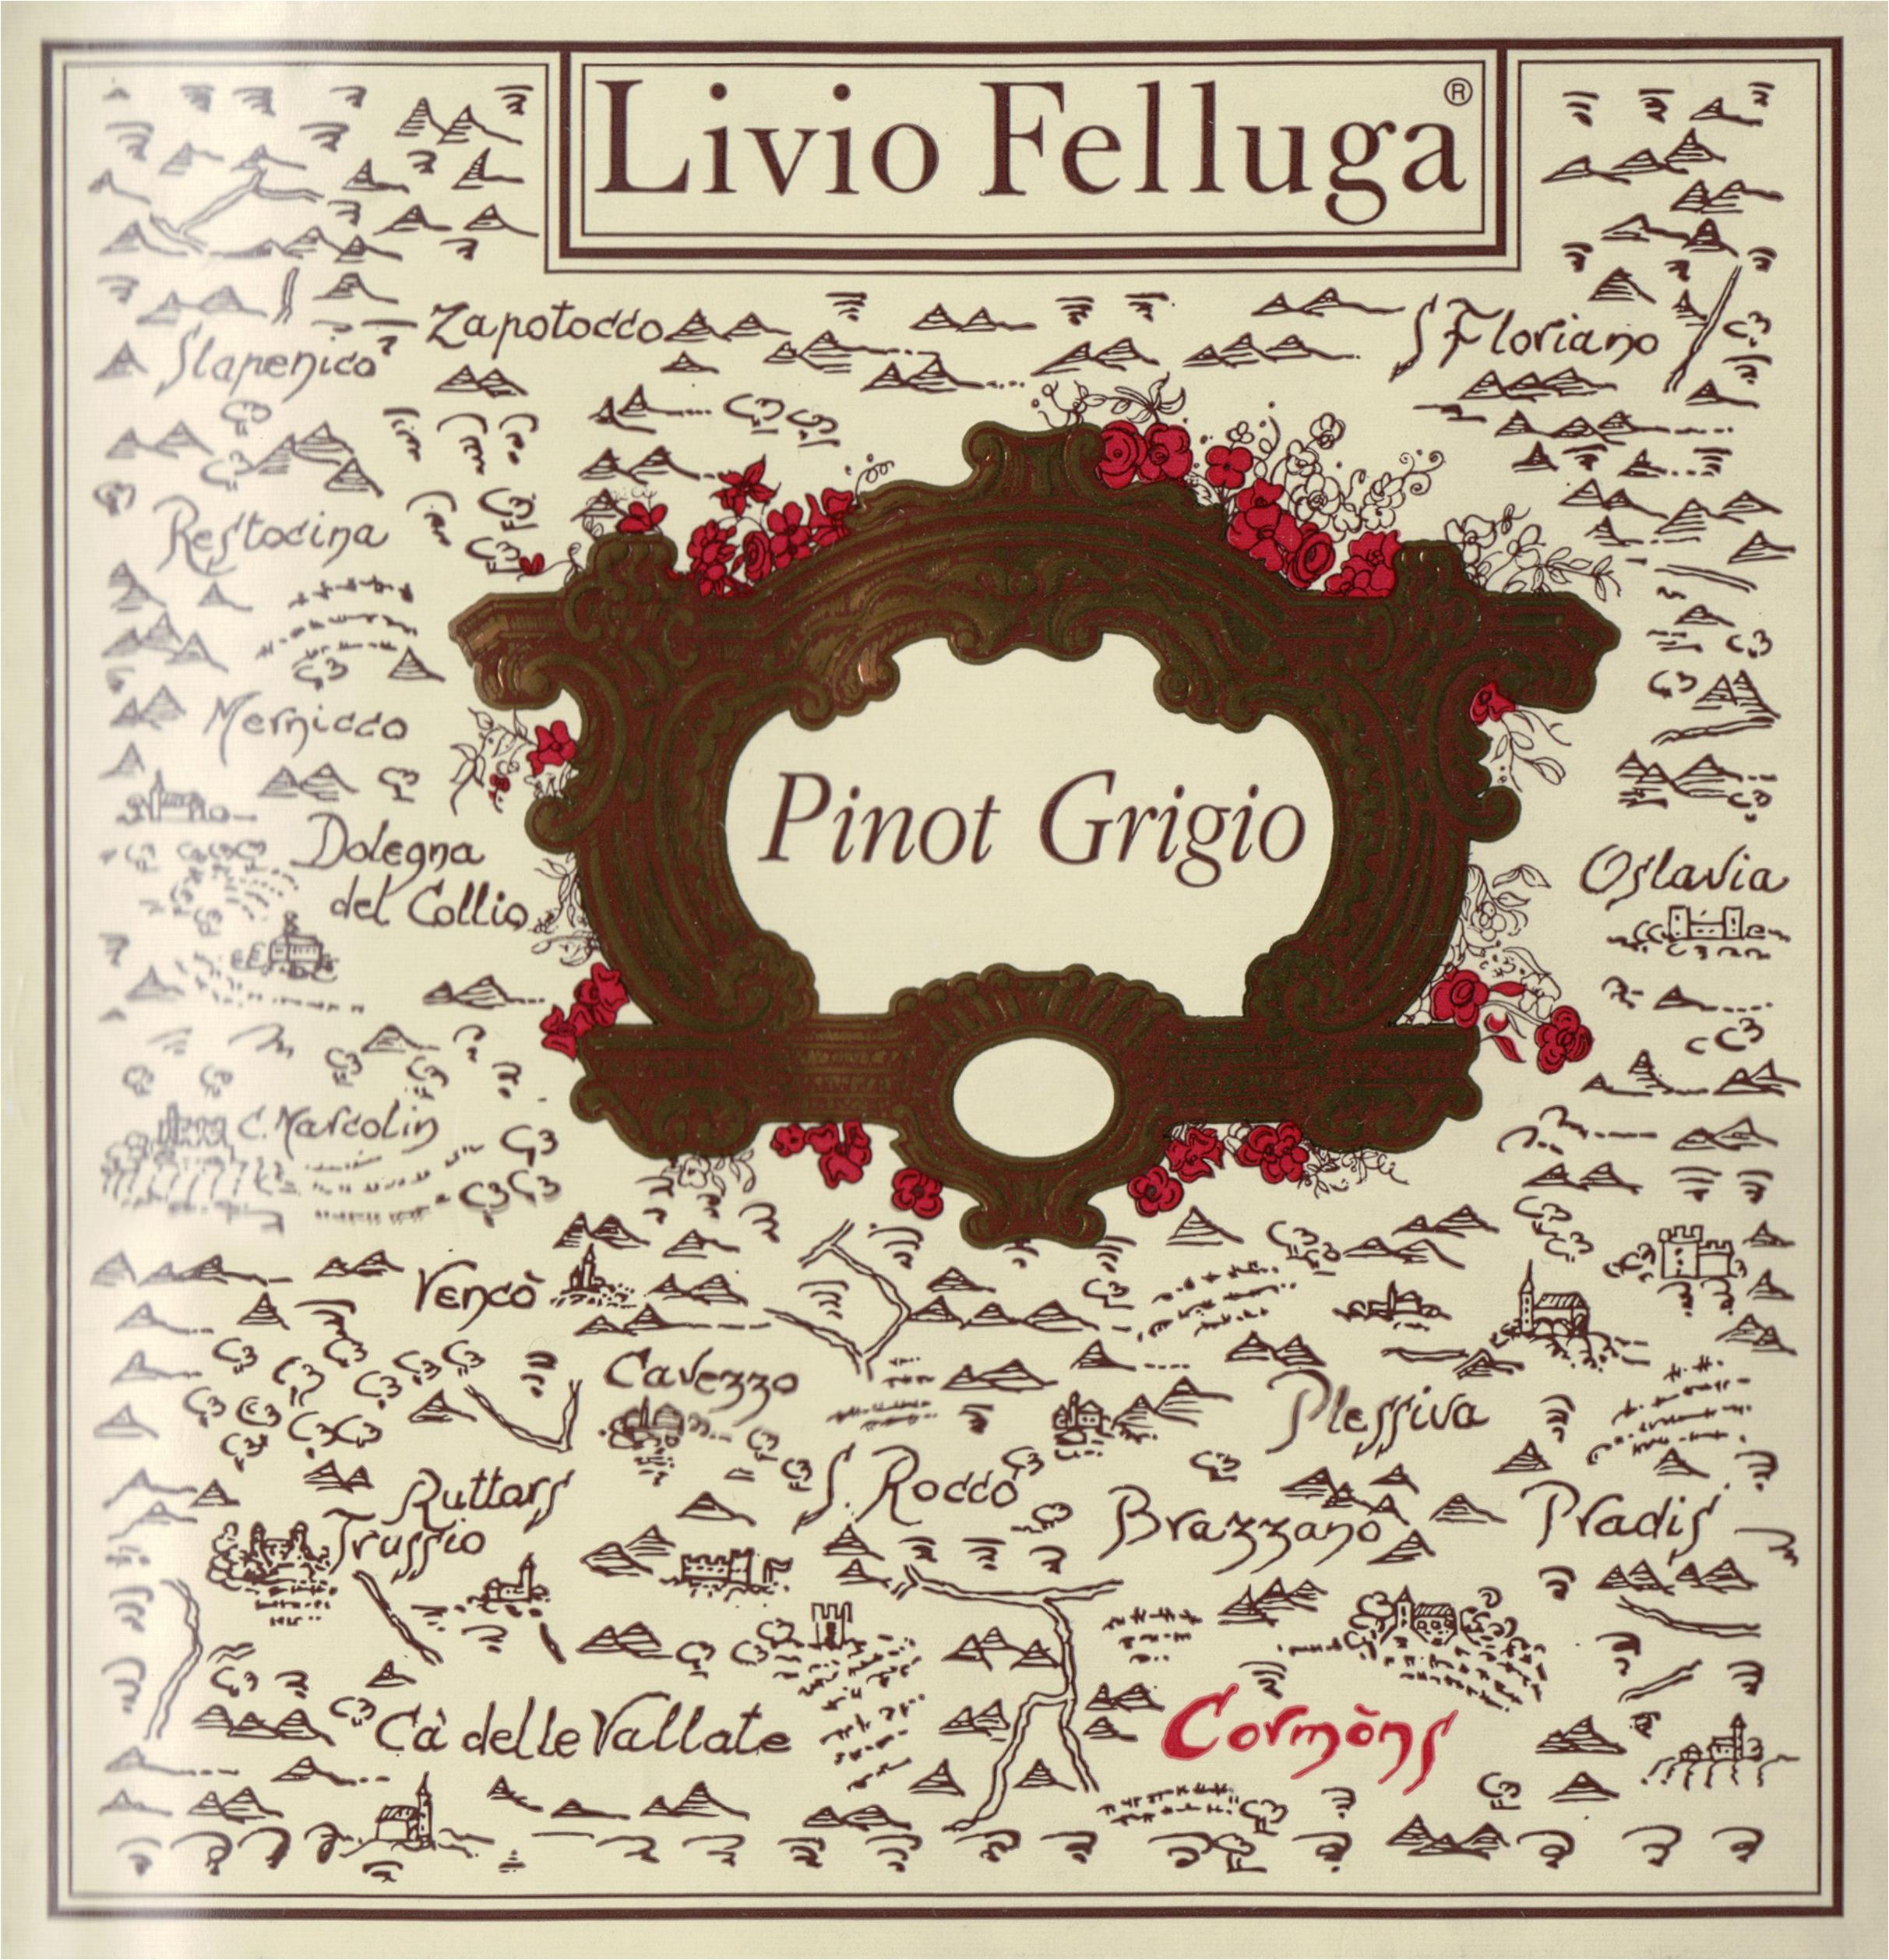 Livio Felluga Pinot Grigio 2018